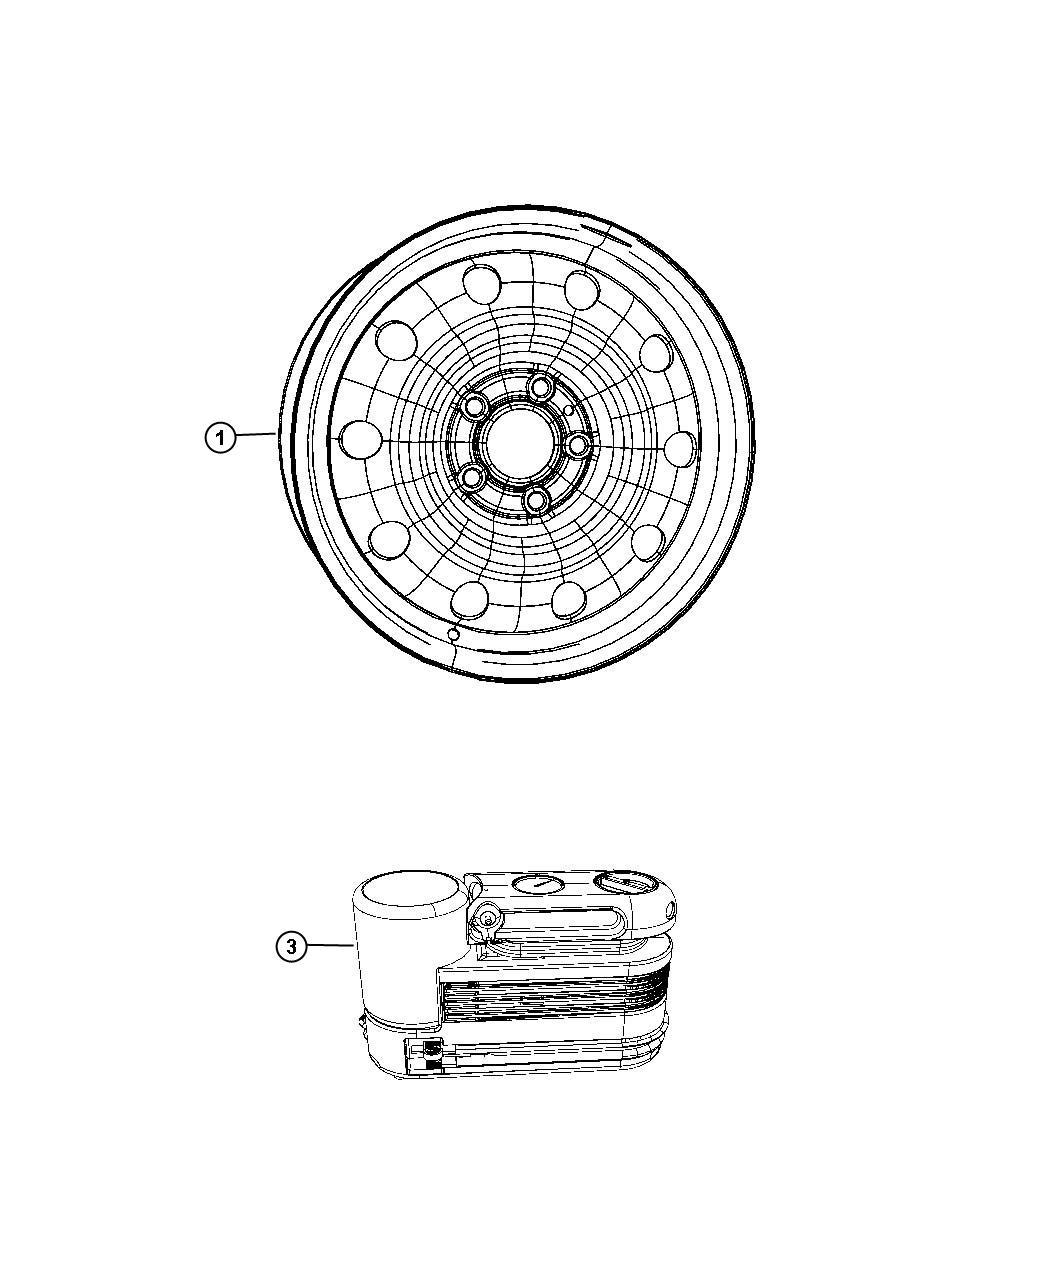 tags: #chevy hhr steering diagram#hhr parts diagram#custom chevy hhr#chevy  hhr fuse box diagram#jeep grand cherokee diagrams#chevrolet hhr engine